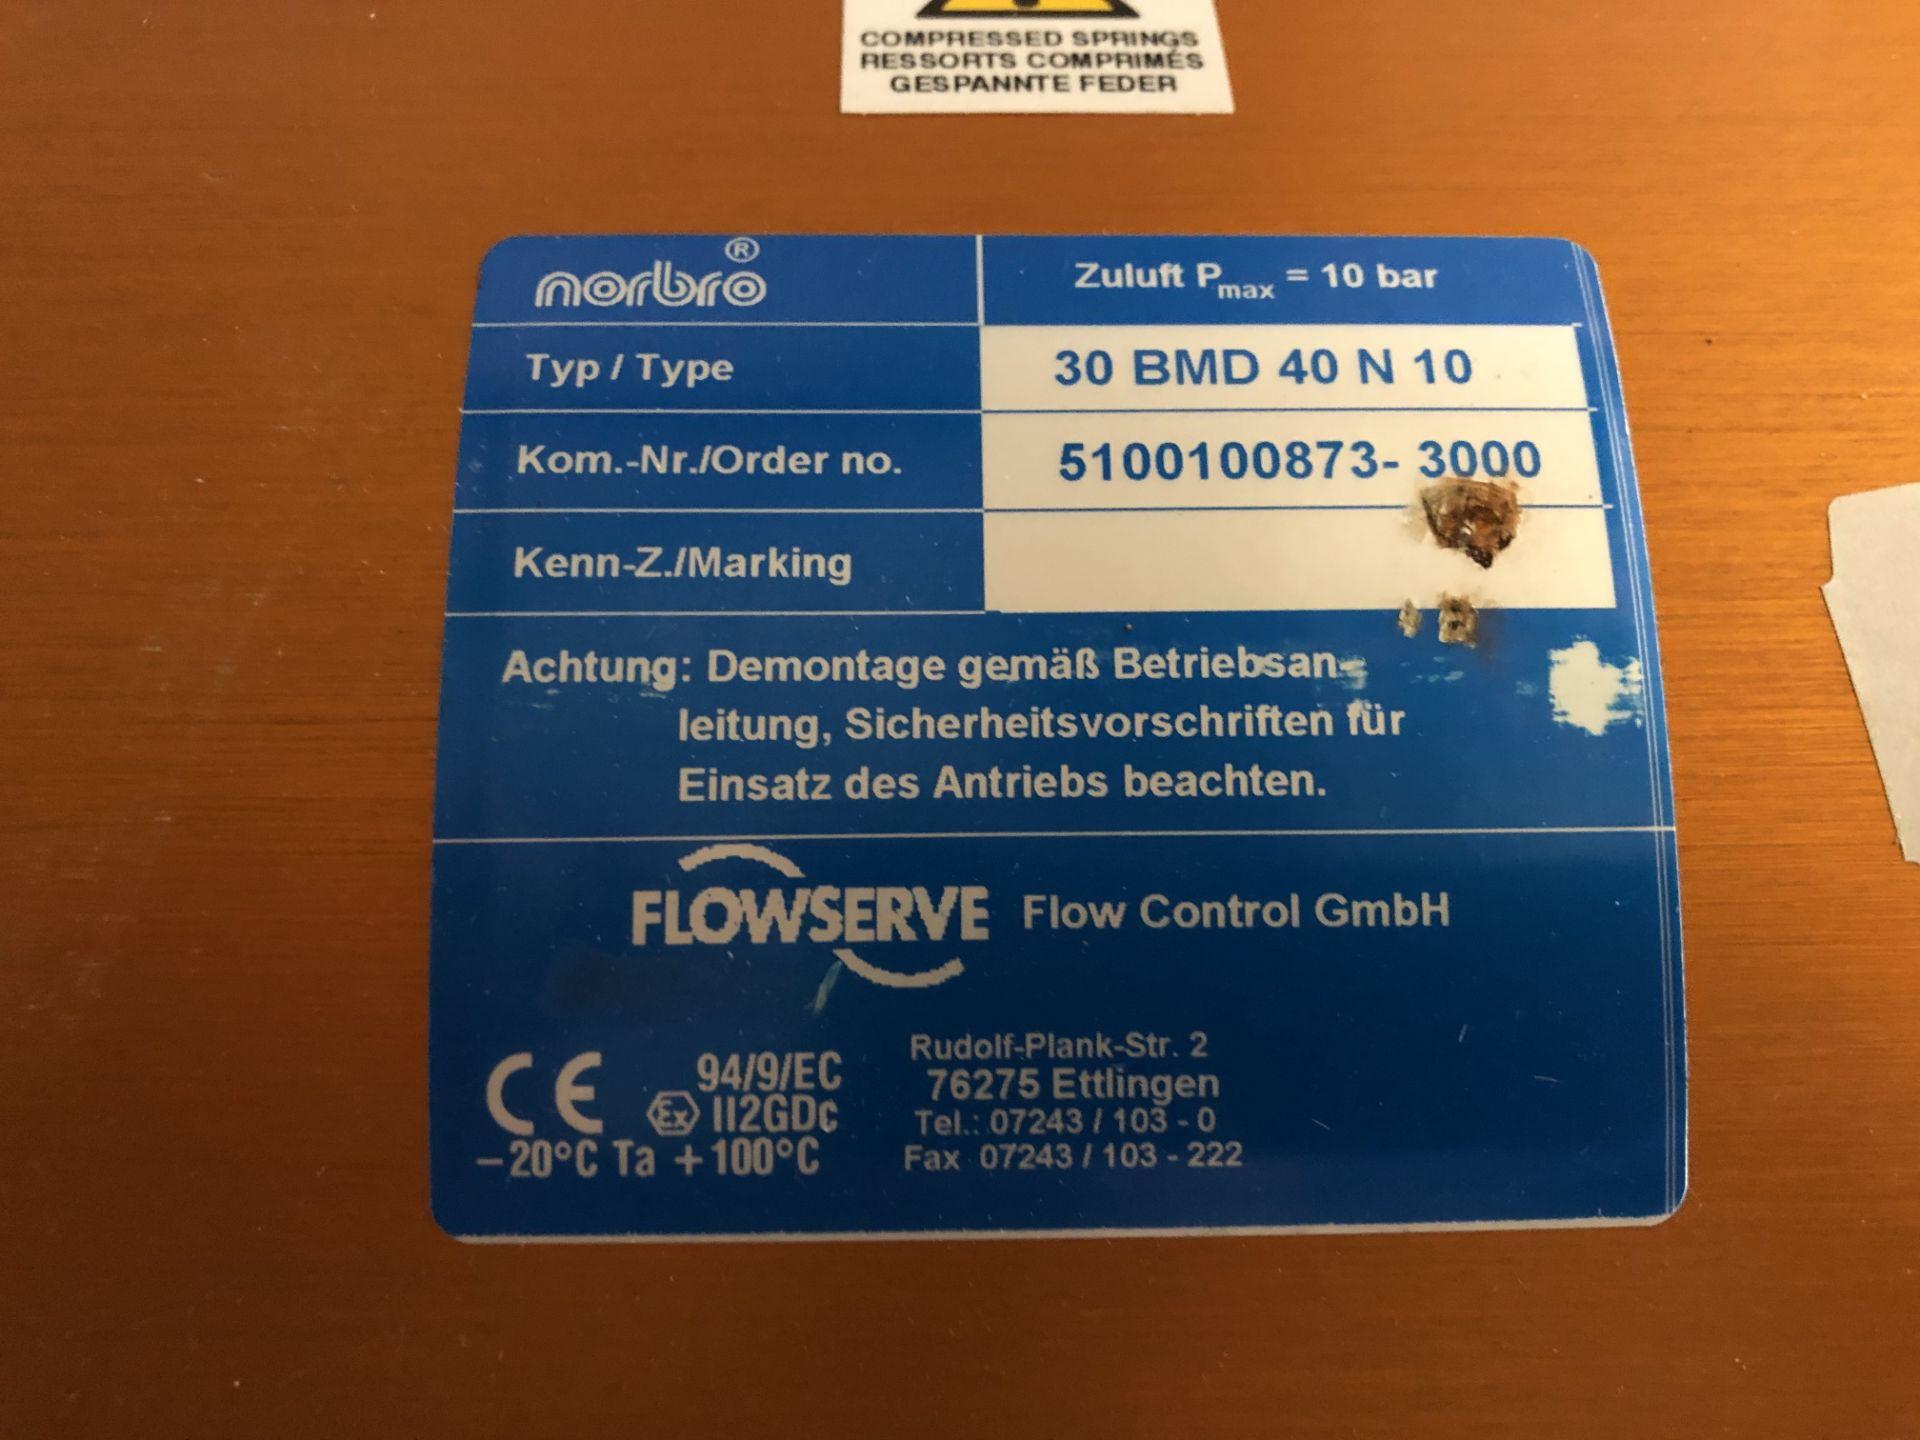 Lot 72A - Flow Control GMbH, Model #30 BMD-40-N-10